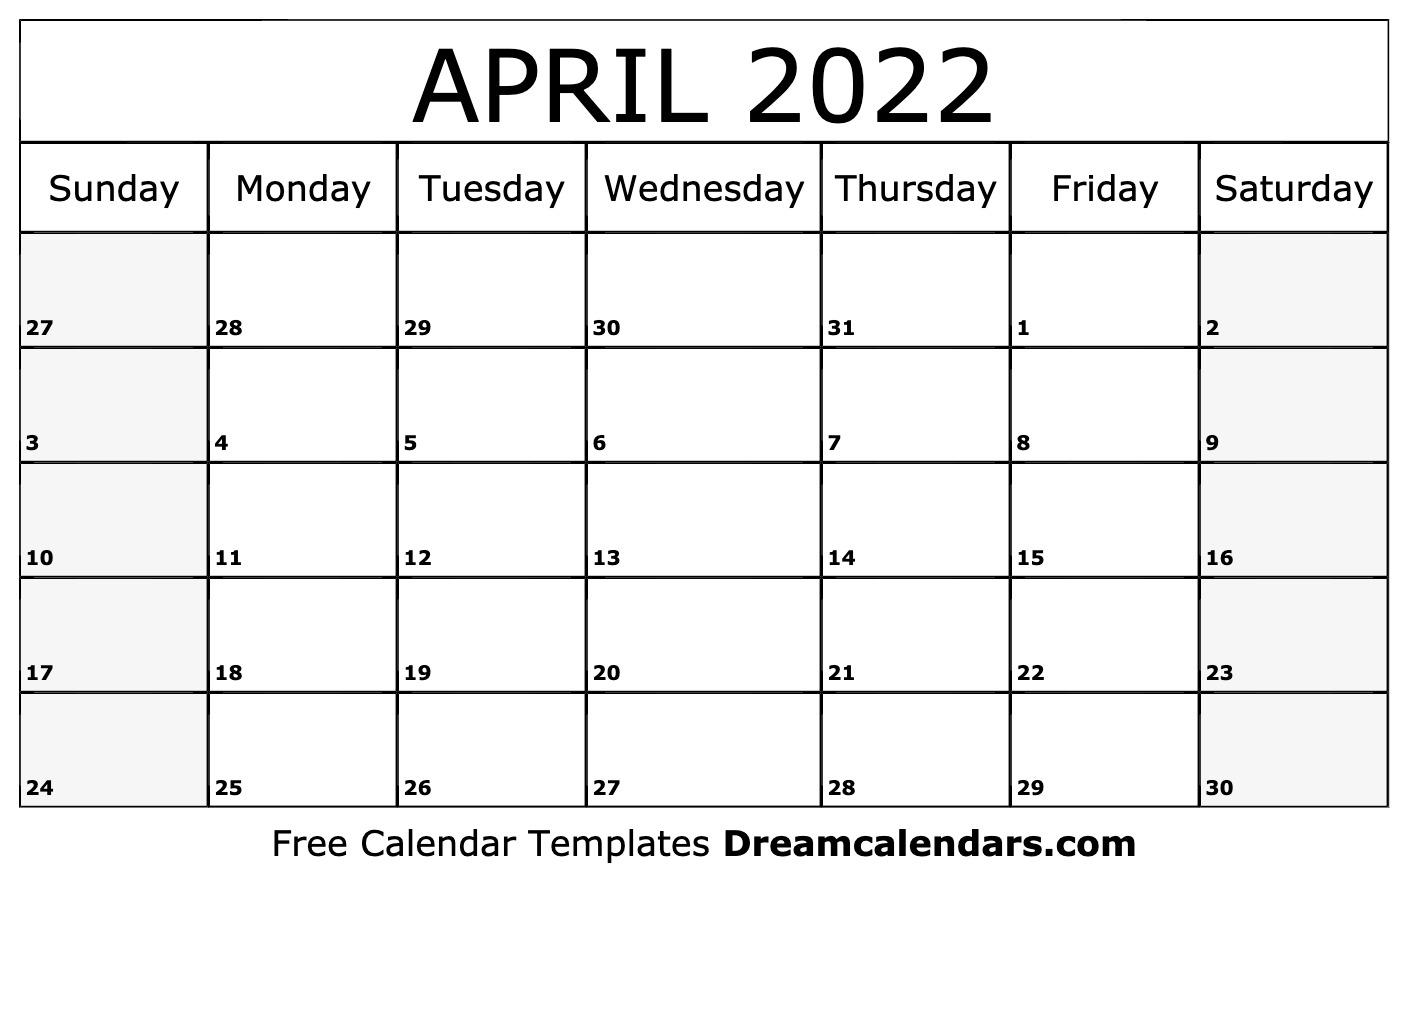 april 2022 calendar printable sunday start full day names. April 2022 calendar   free blank printable templates